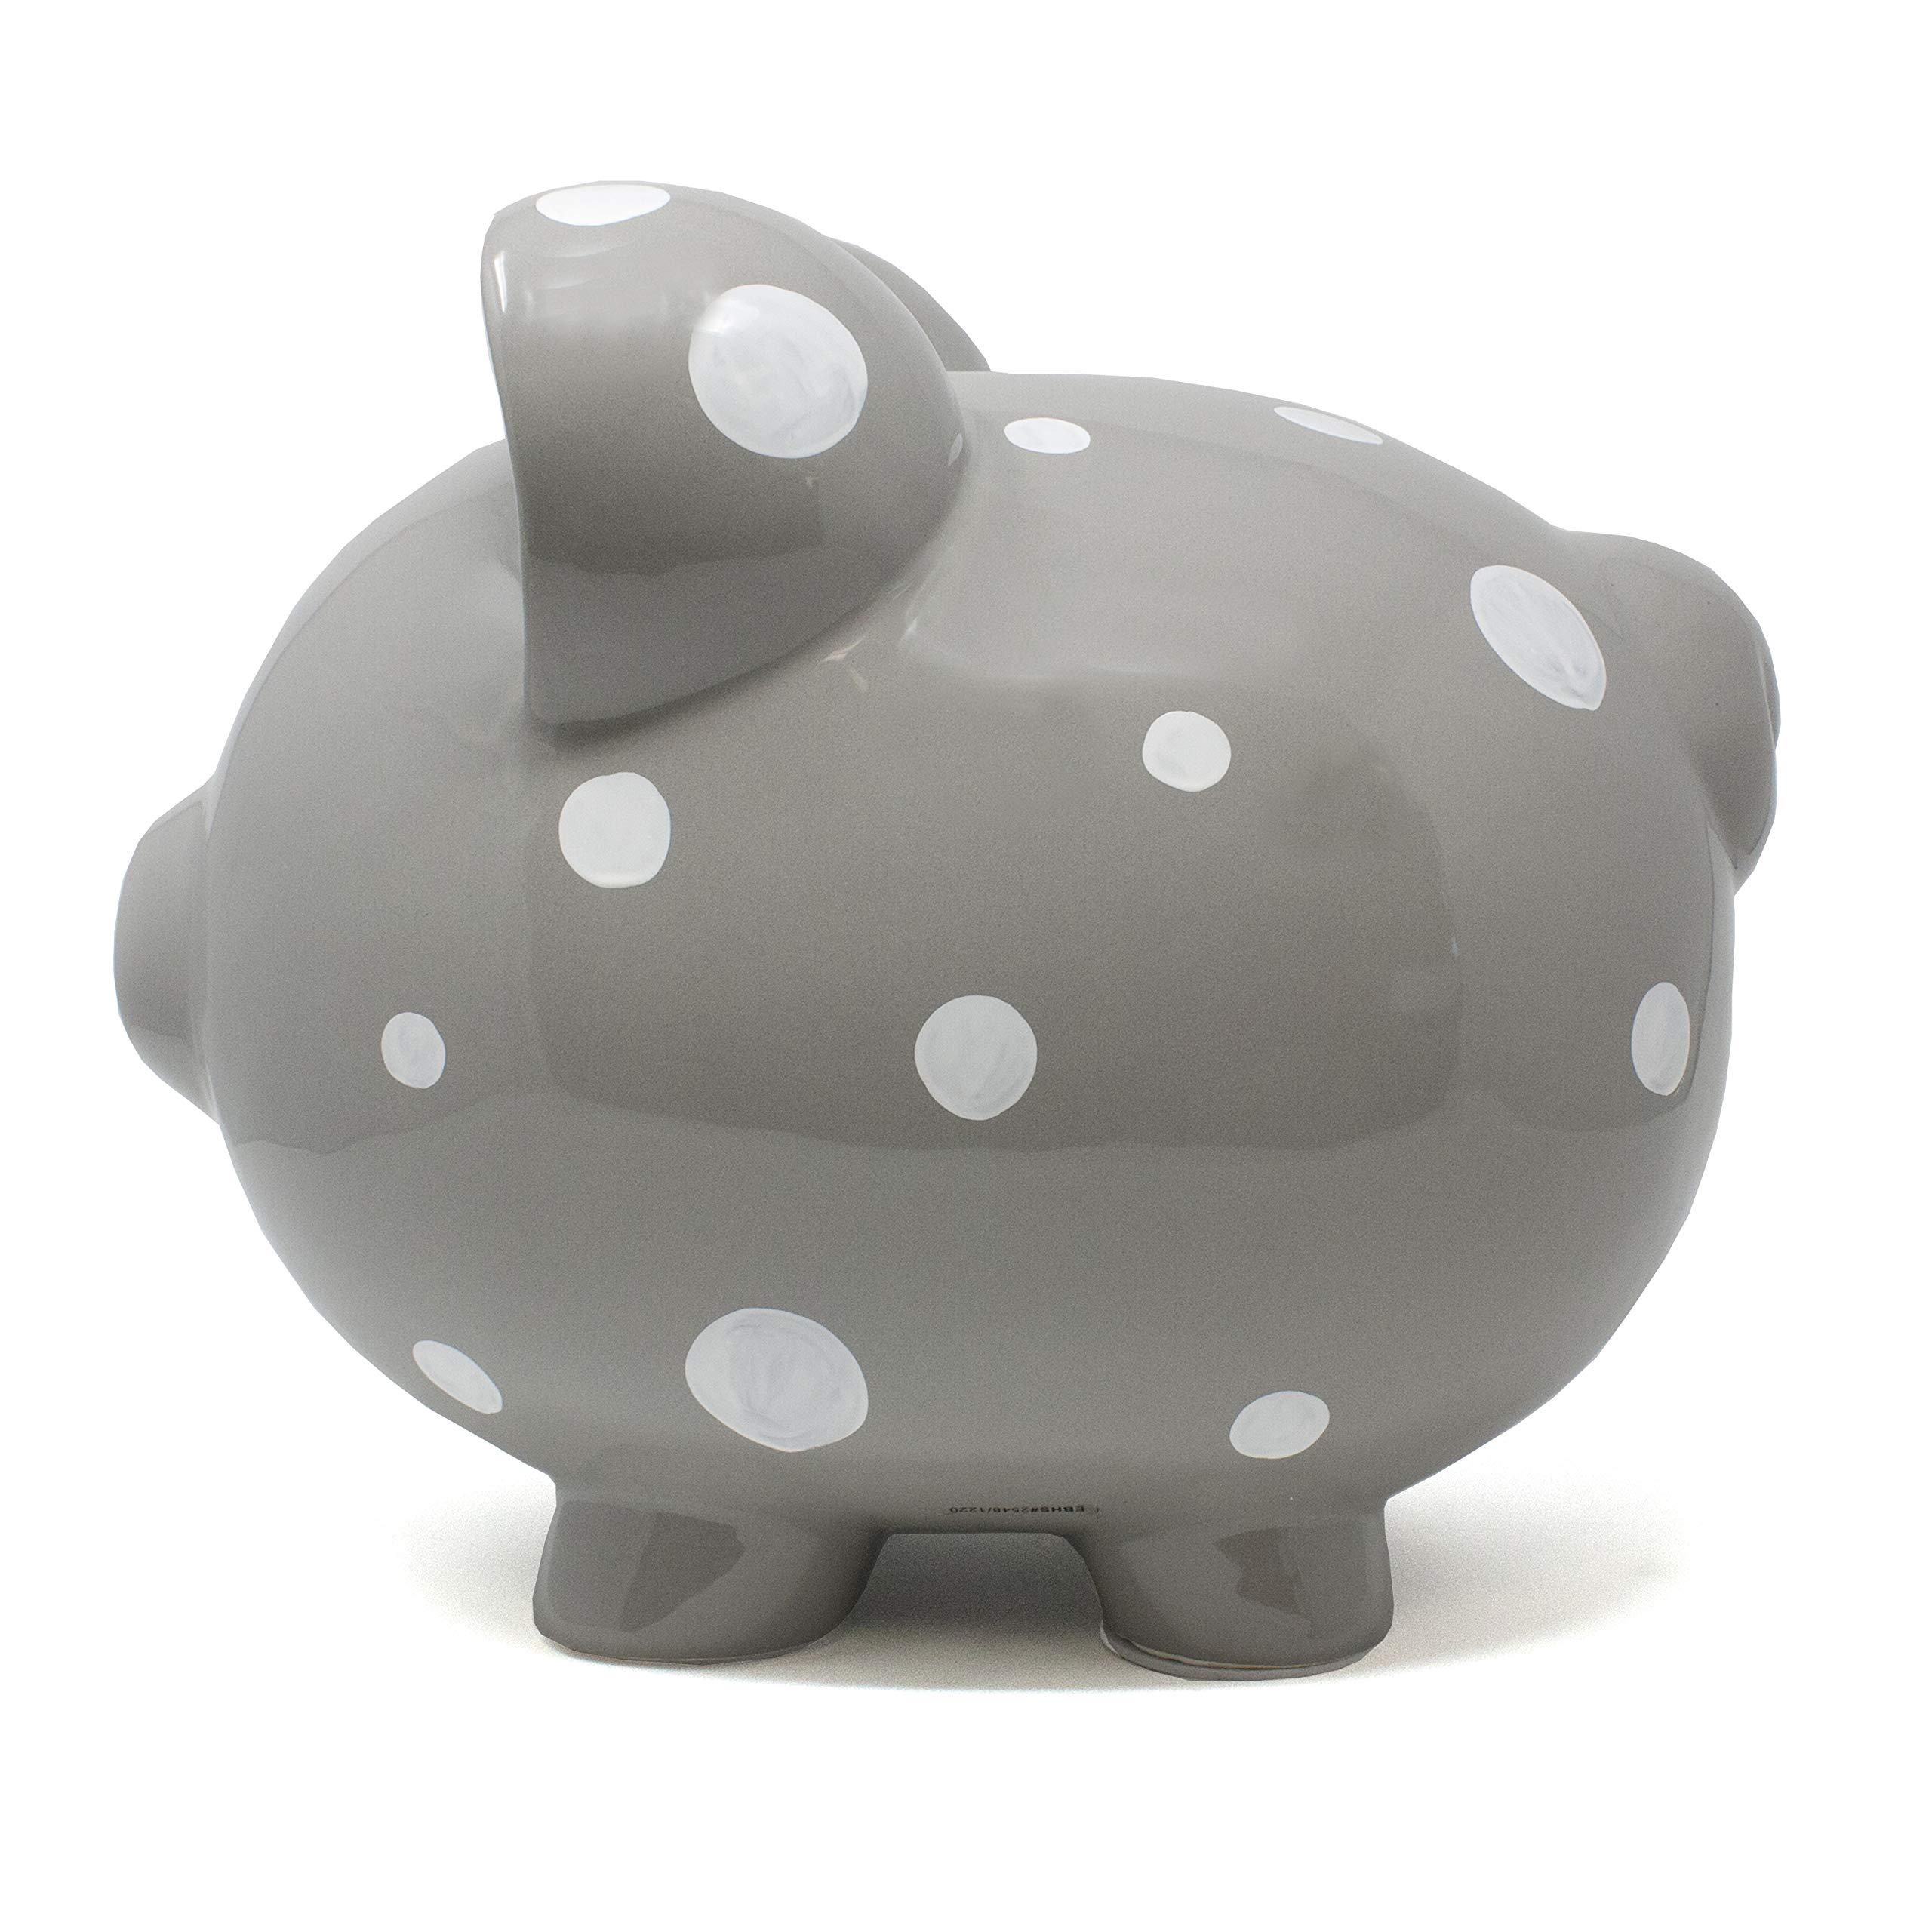 Child to Cherish Large Ceramic Boss Piggy Bank, Gray Polka Dot by Child to Cherish (Image #4)